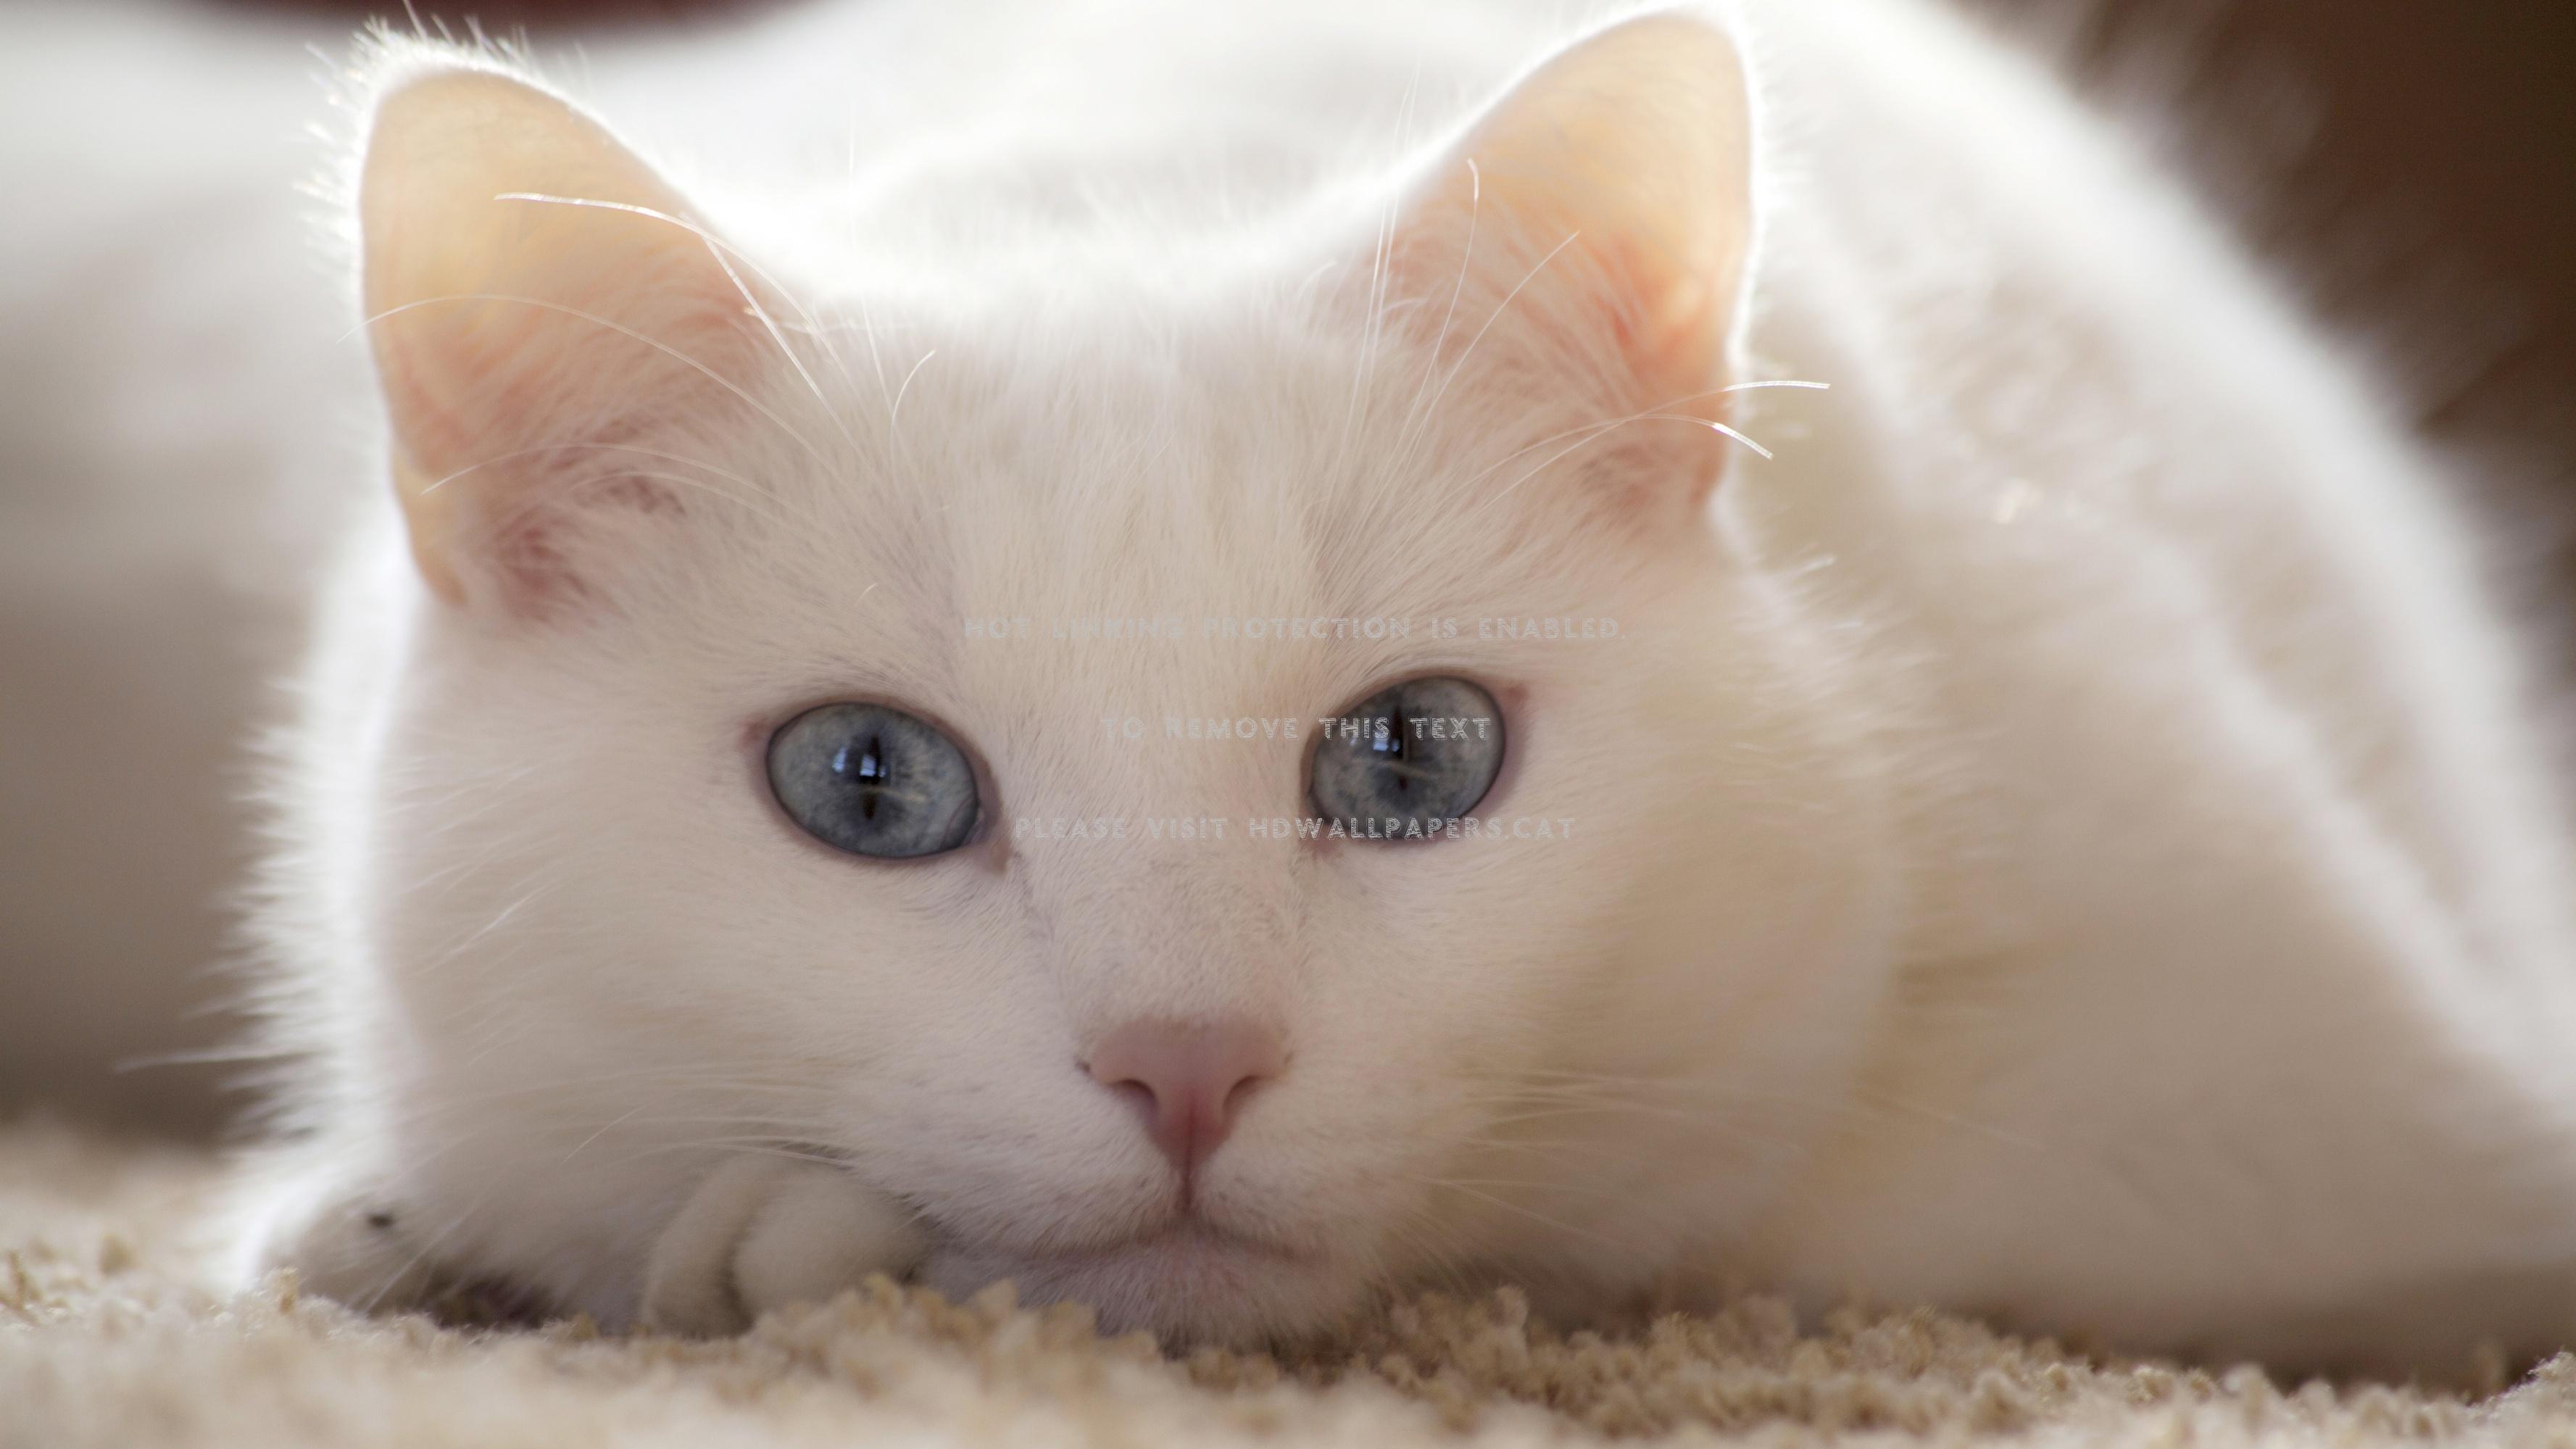 Beautiful White Cat Cute Blue Eyes Animals White Cat With Short Fur 3554x1999 Wallpaper Teahub Io